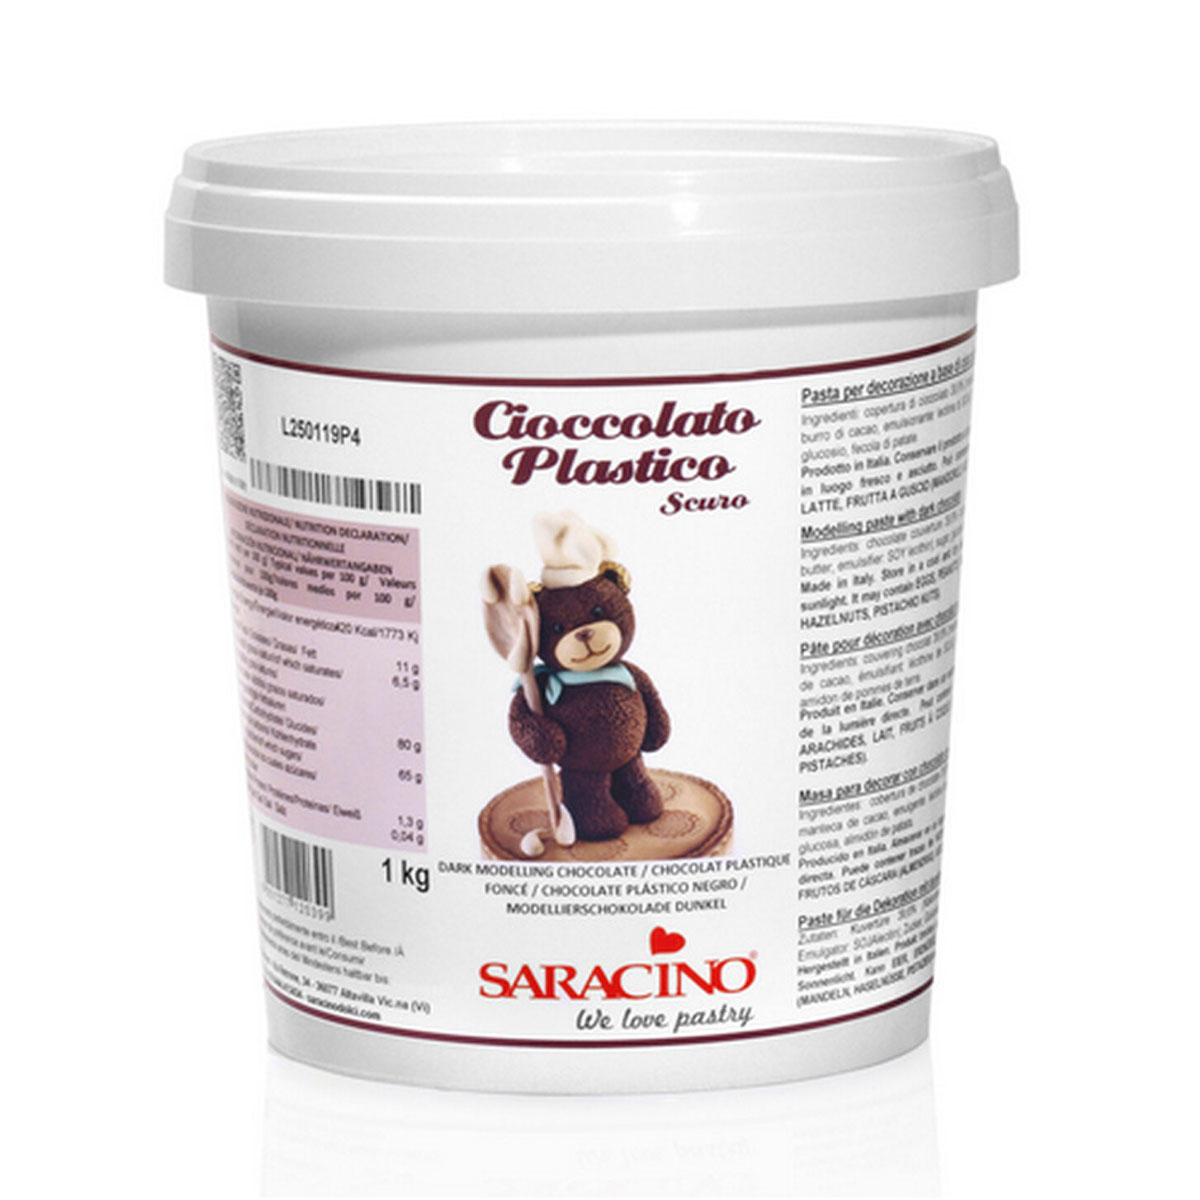 Saracino Cioccolato Plastico - Modellieschokolade Dark 1 Kg